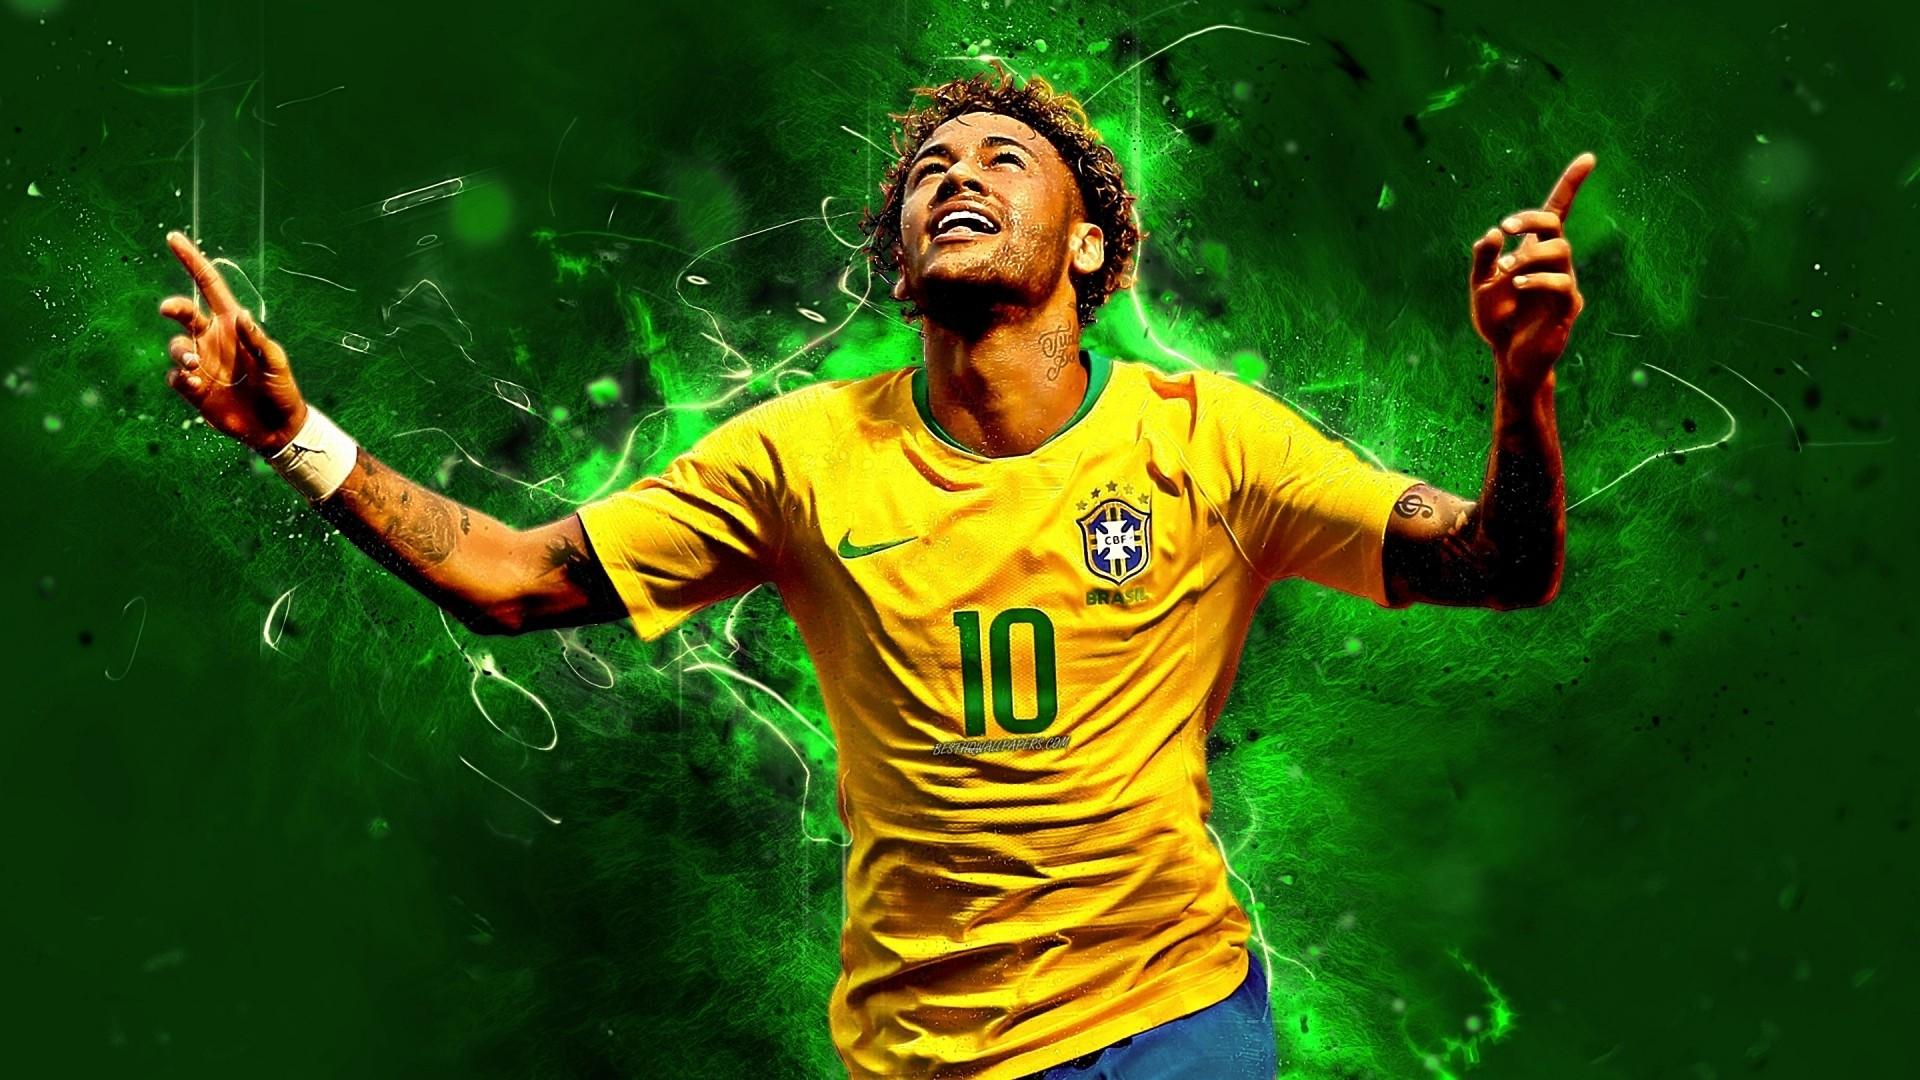 Neymar Jr wallpaper photo hd